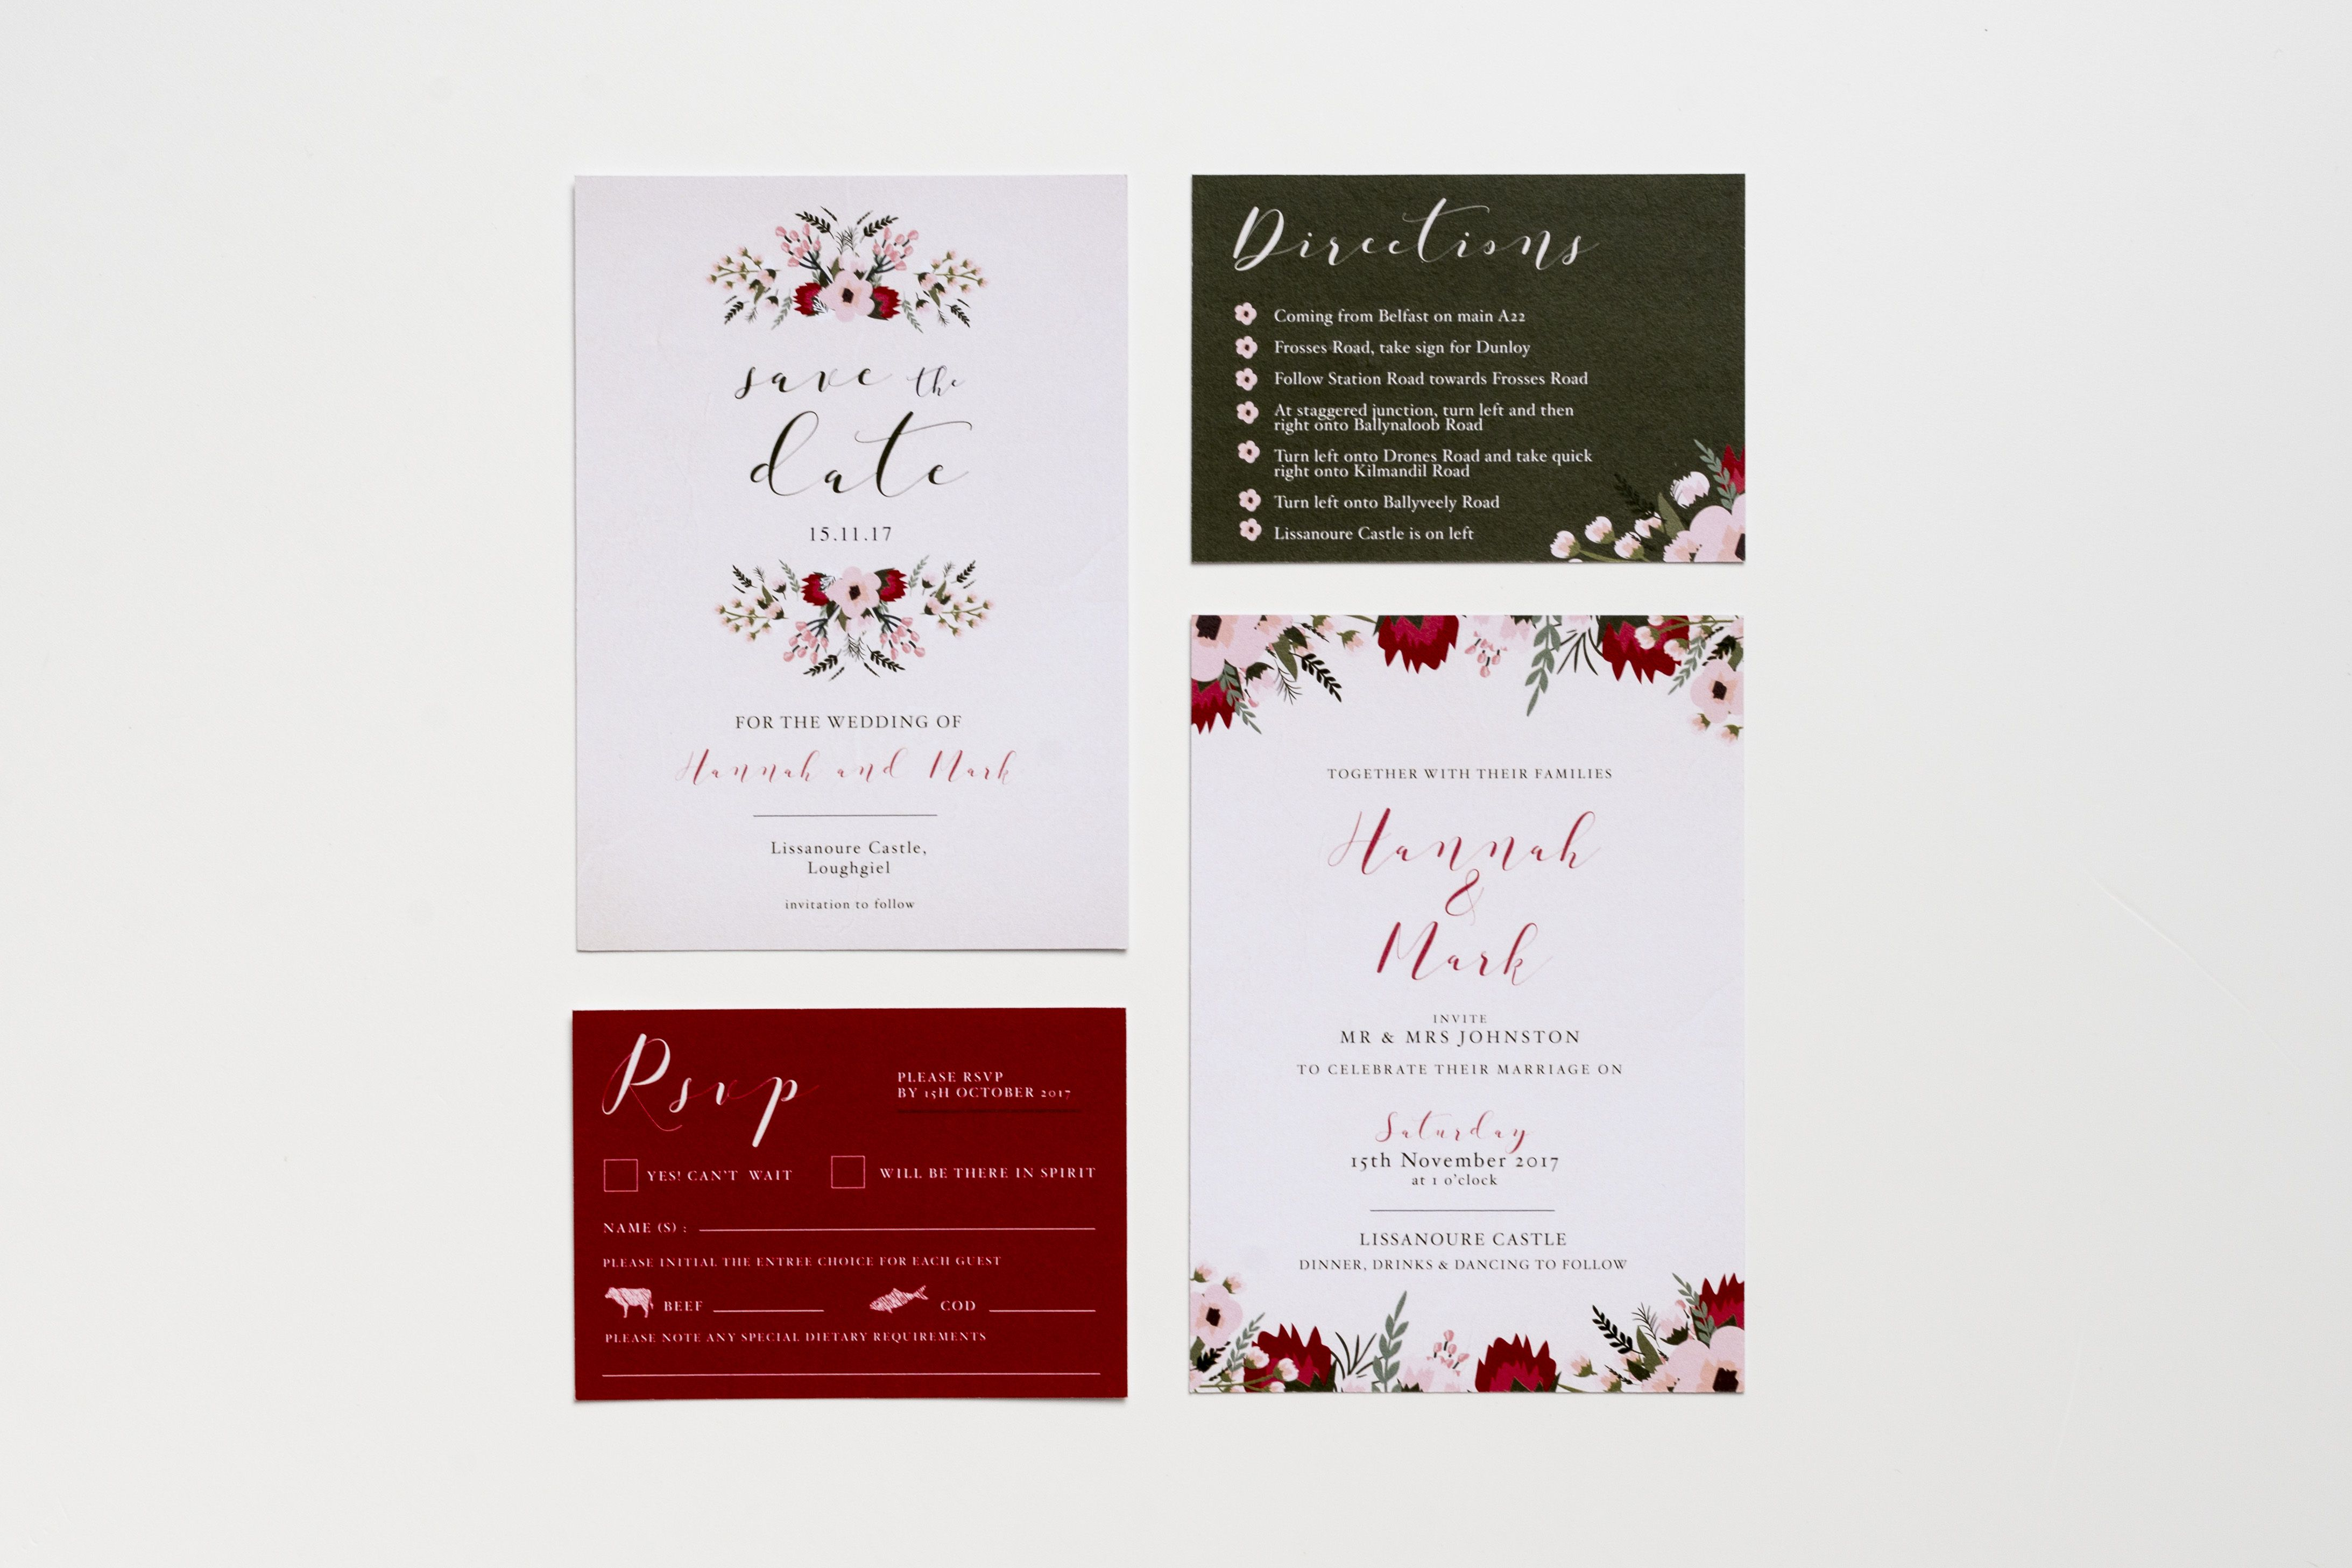 Beautiful Wedding Stationery Design Print In Belfast  E2 9c 93 High Quality Printing  E2 9c 93 Bespoke Card Stocks  E2 9c 93 Excellent Customer Service  E2 9c 93